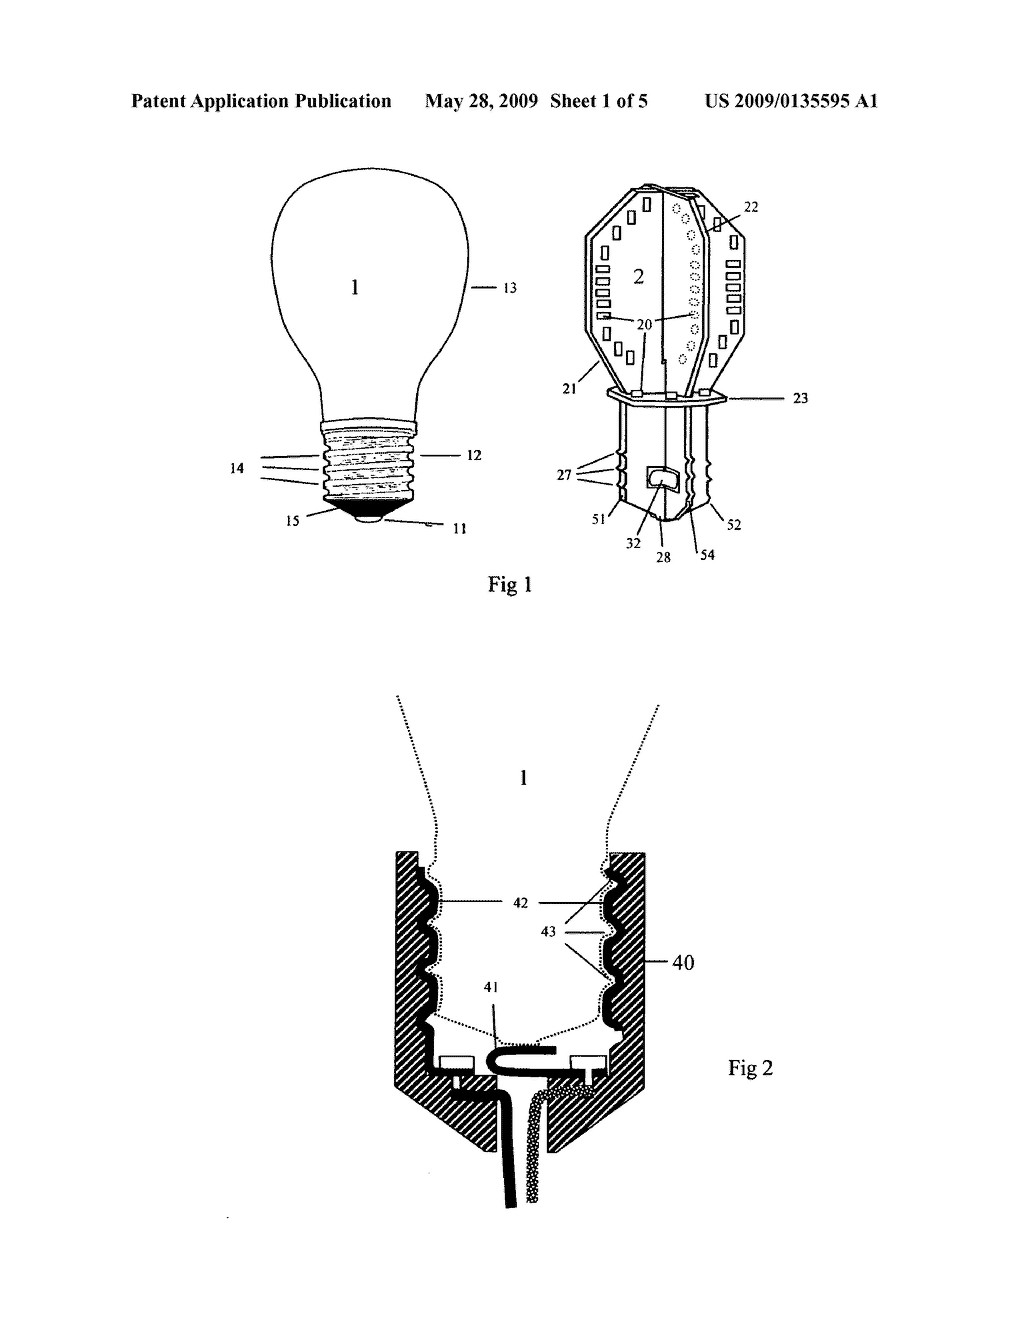 Lamp Socket Diagram - Data Wiring Diagram Today - Light Socket Wiring Diagram